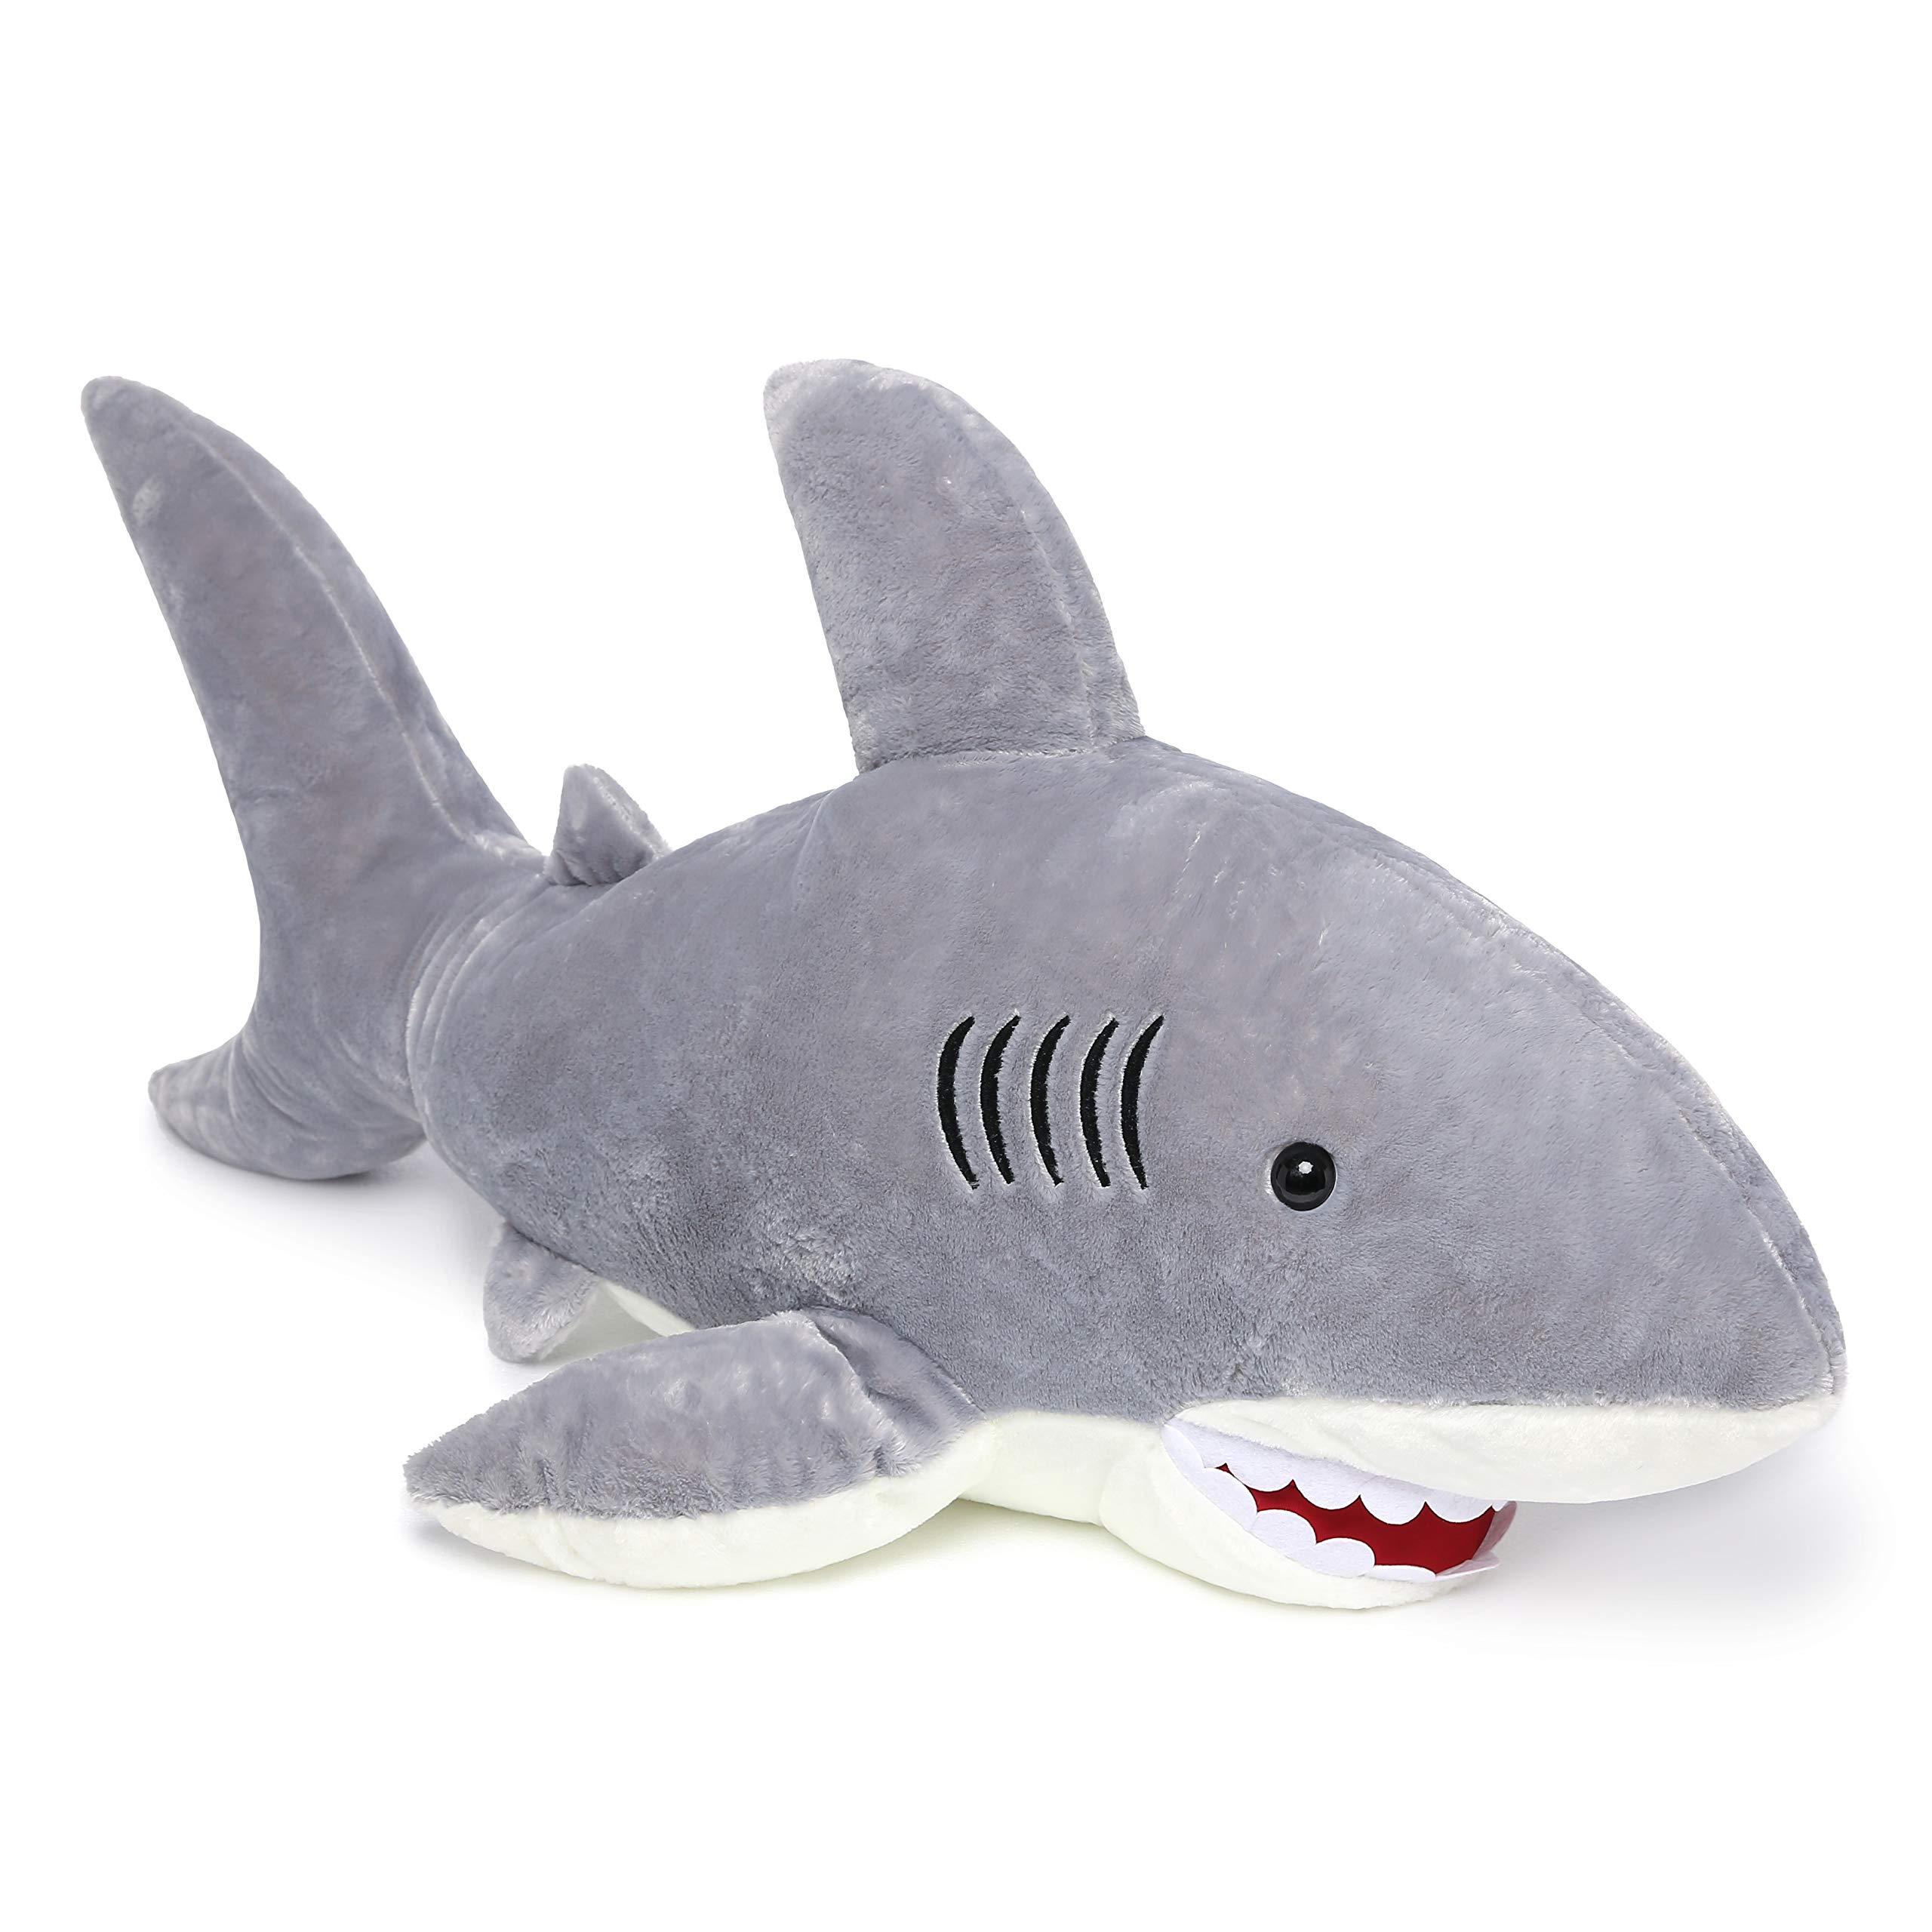 MorisMos Giant Shark Stuffed Animal,Gray Shark Plush Pillow,Plush Toy,Gift for Kids Girlfriend,51 Inches by MorisMos (Image #2)